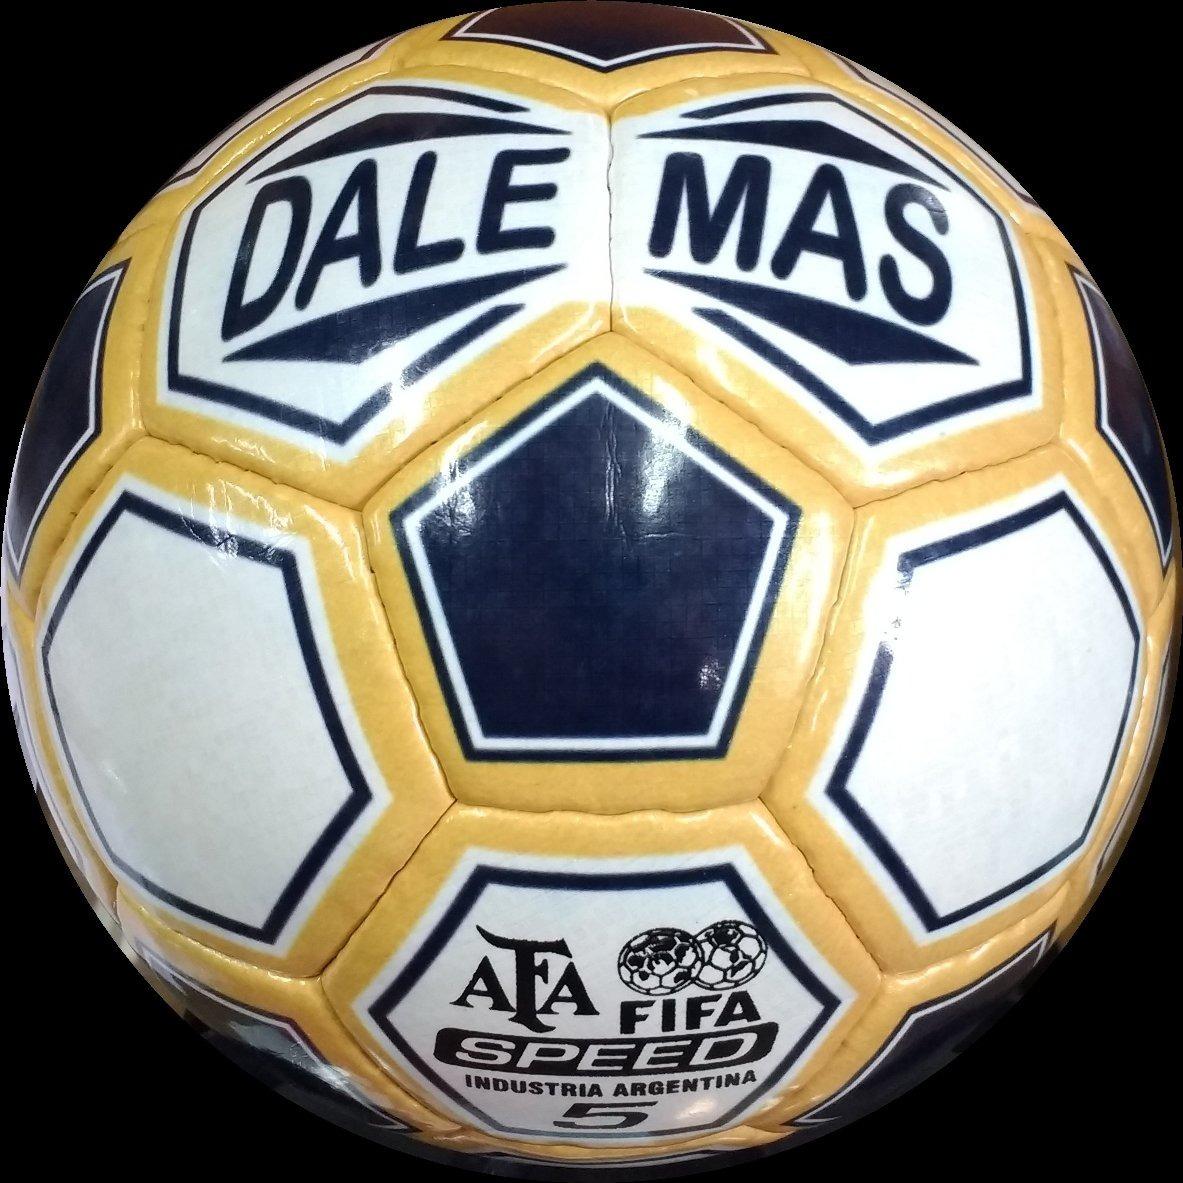 pelota futbol dalemas speed 5 oficial afa fifa profesional. Cargando zoom. 2279da0442d94